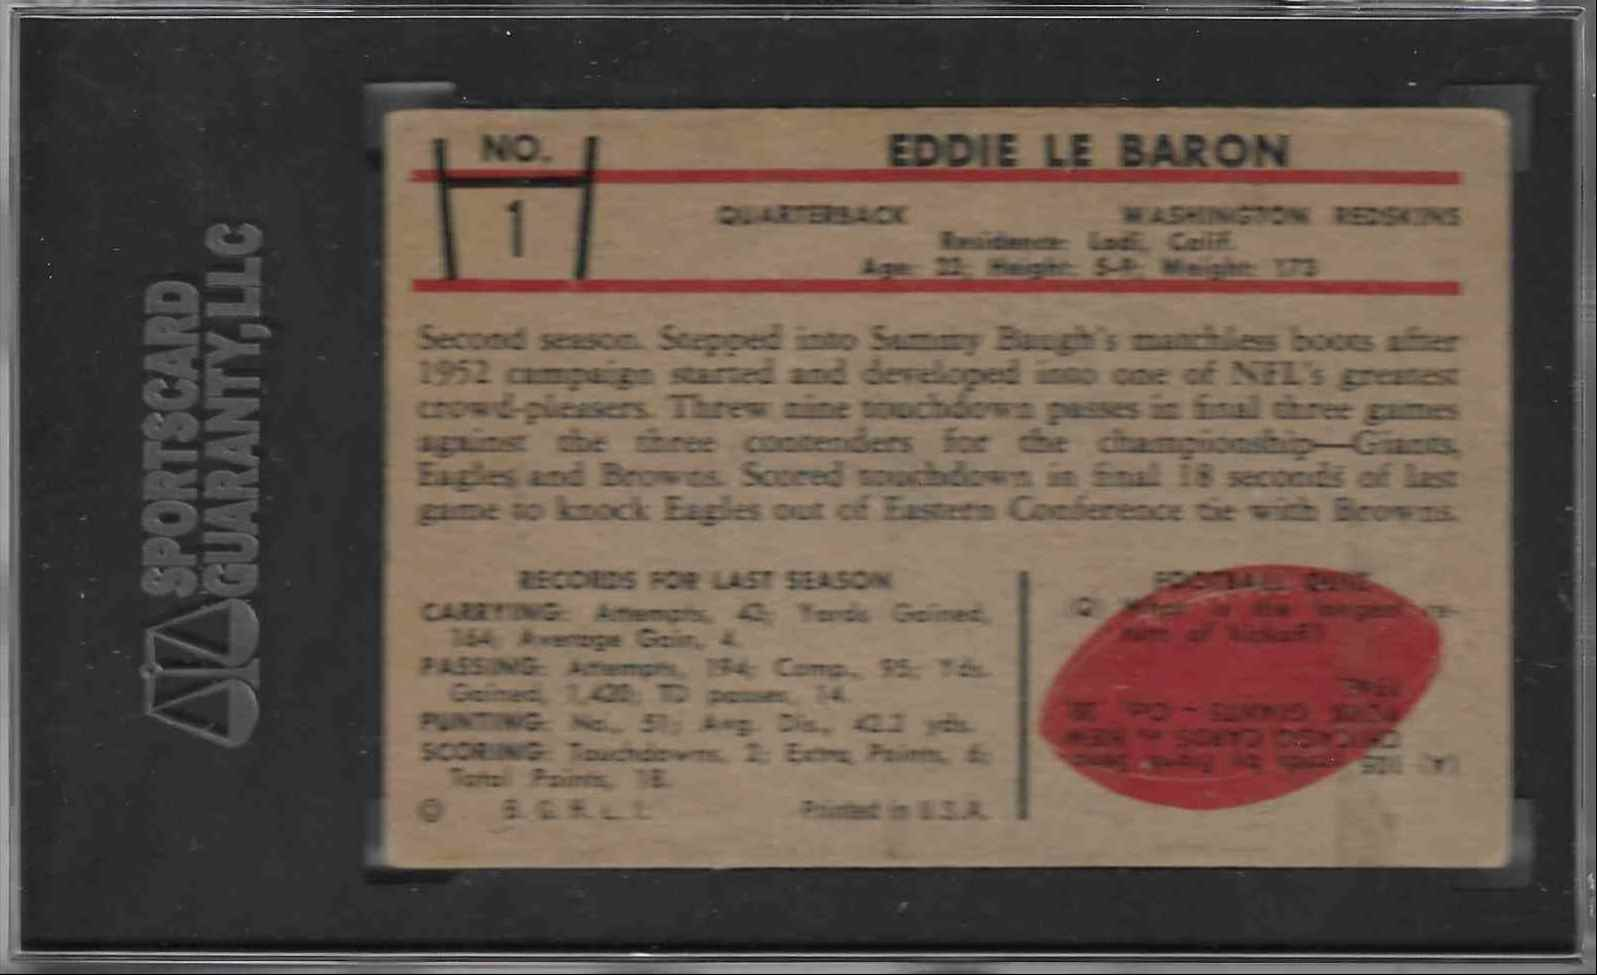 1952 Bowman Eddie Le Baron #1 card back image